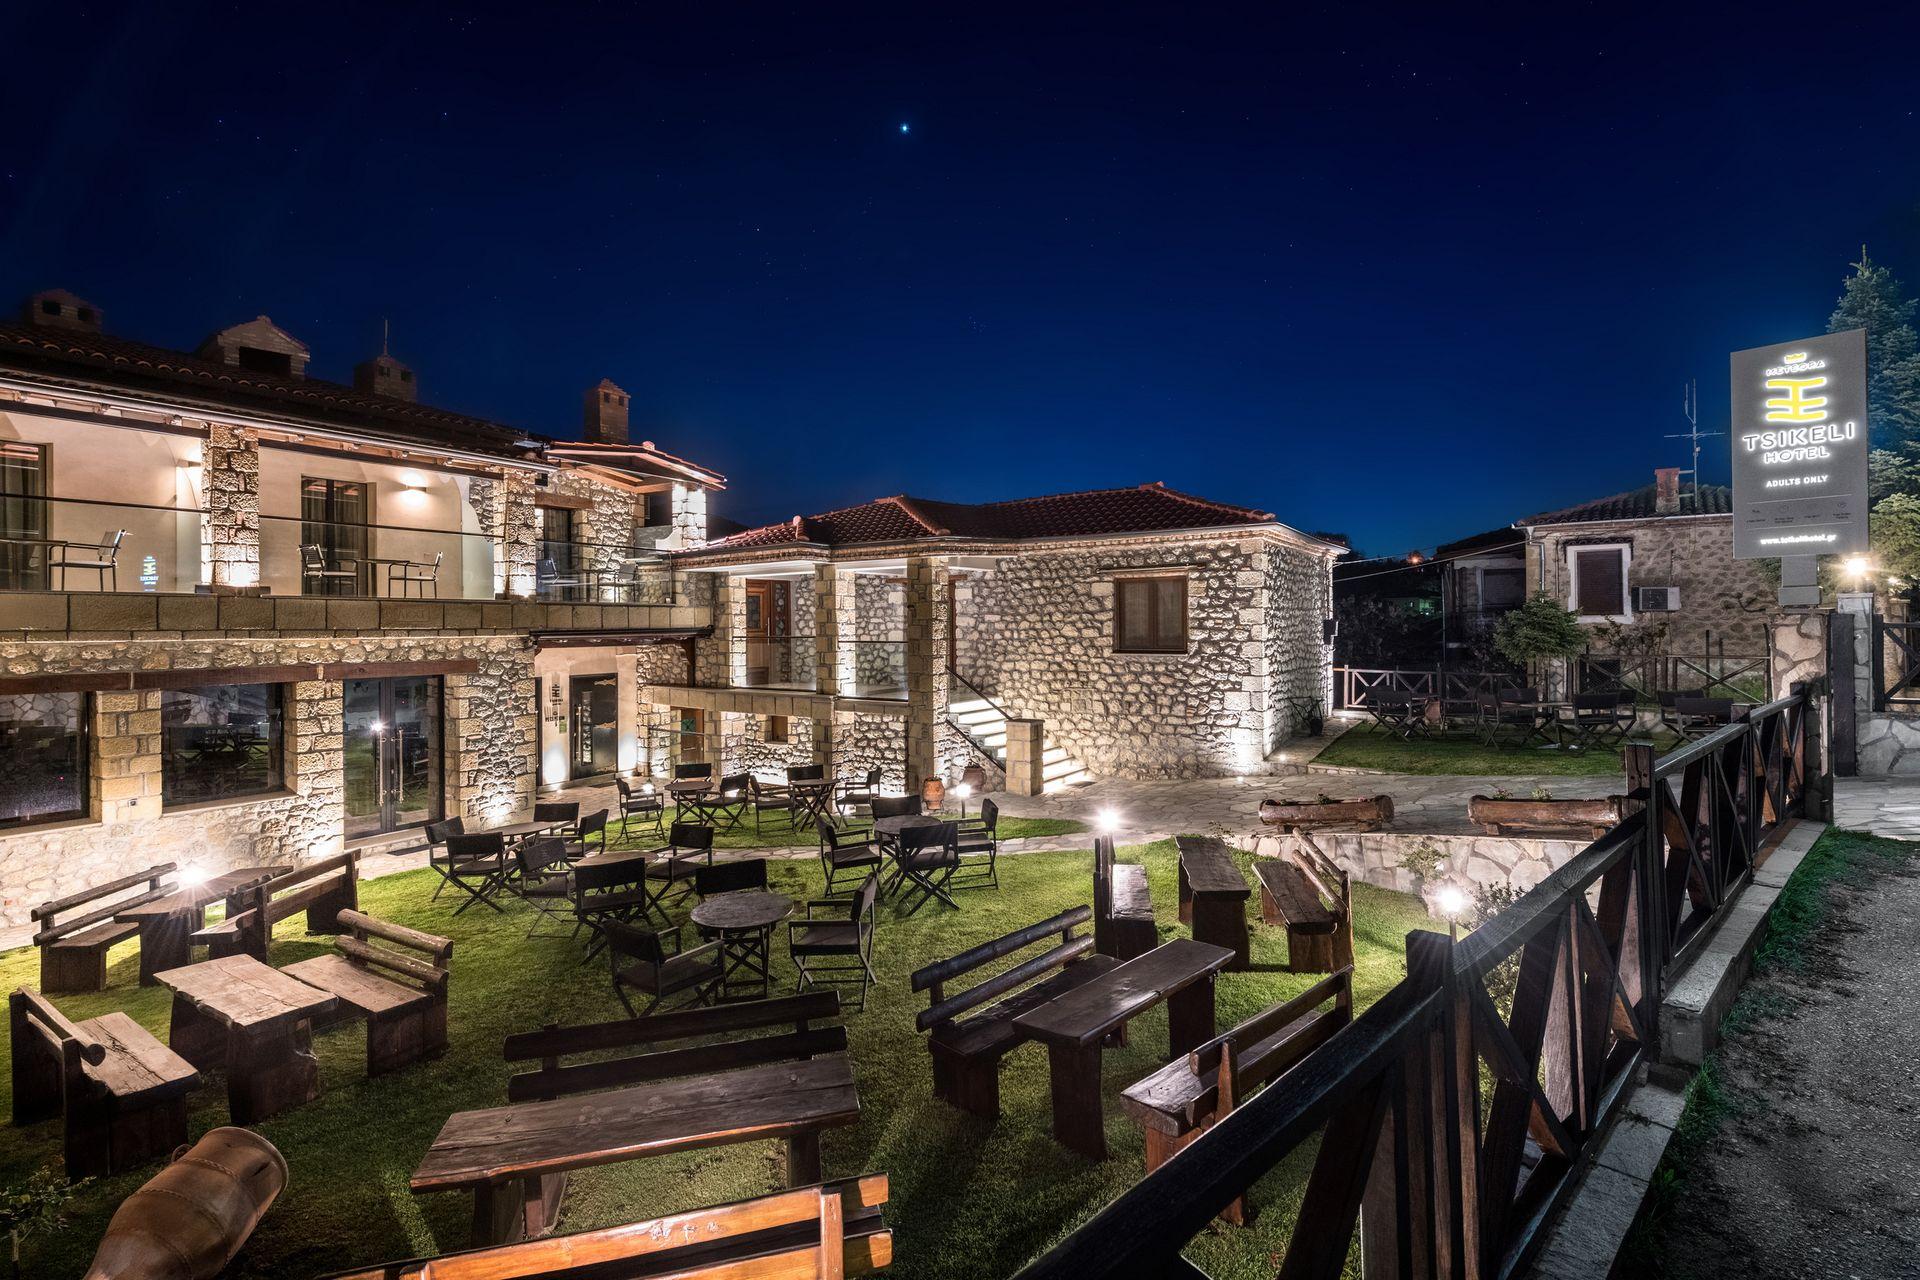 Tsikeli Hotel Meteora - Καλαμπάκα ✦ 2 Ημέρες (1 Διανυκτέρευση) ✦ 2 άτομα ✦ Πρωινό ✦ έως 07/01/2022 ✦ Υπέροχη Τοποθεσία!